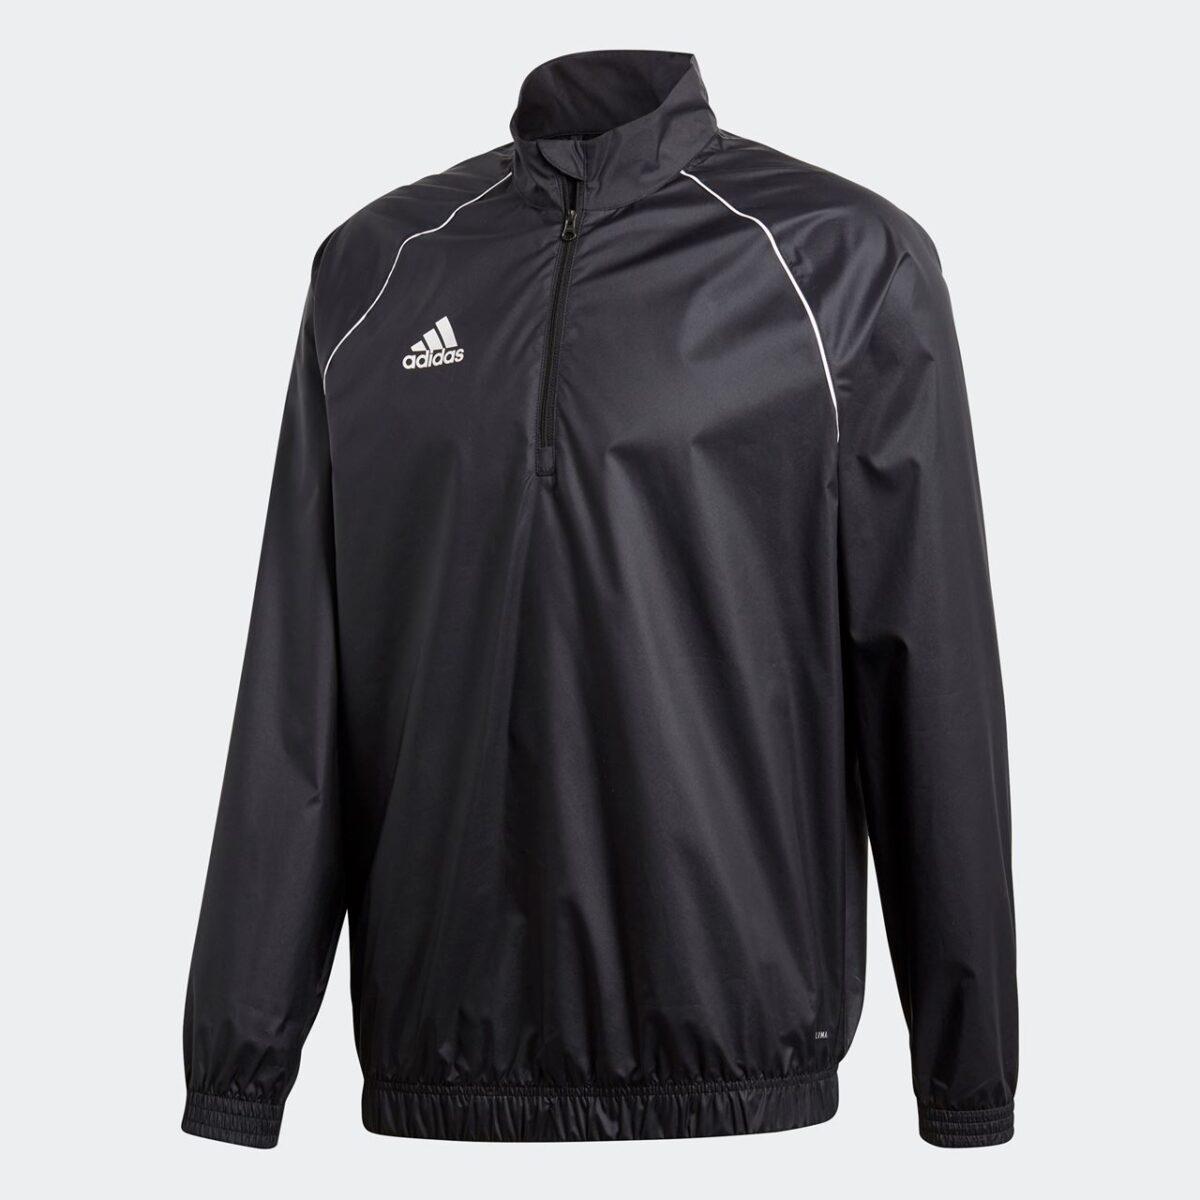 Adidas Core 18 Windbreaker Adult